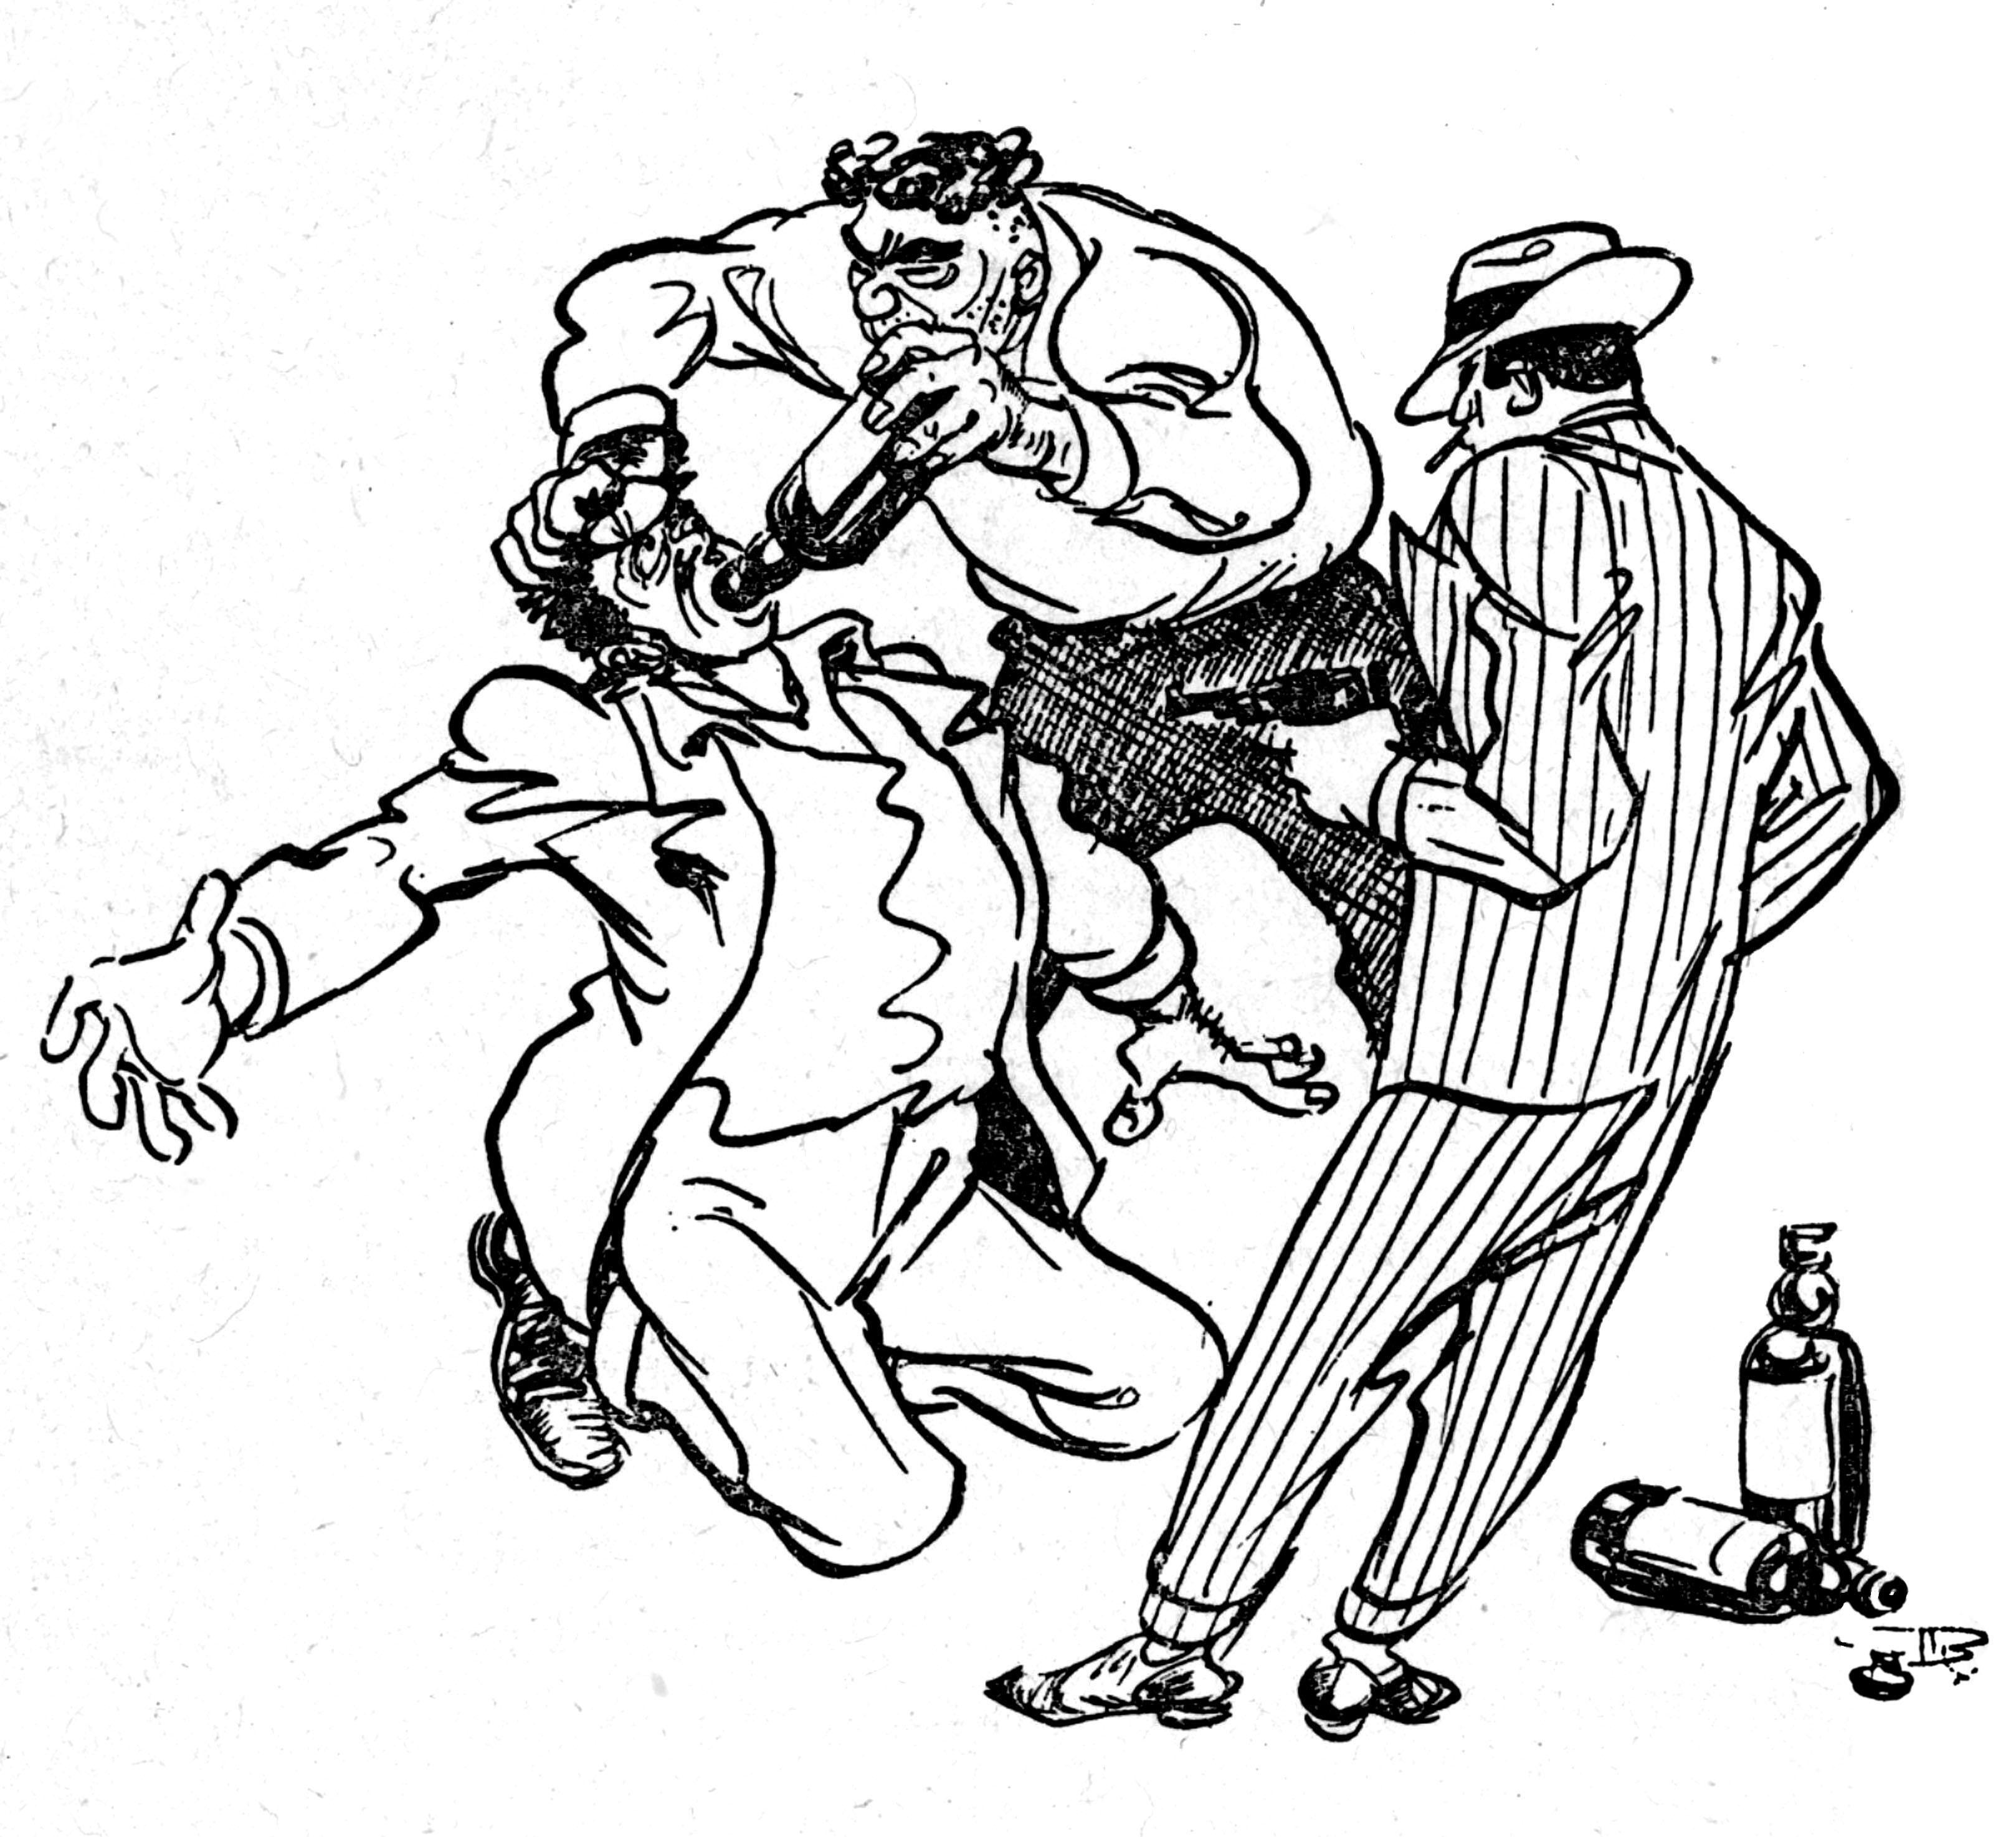 3236x2948 Gangster Cartoon Drawings Cartoon Snap Gangsters, Gunsels, Crooks